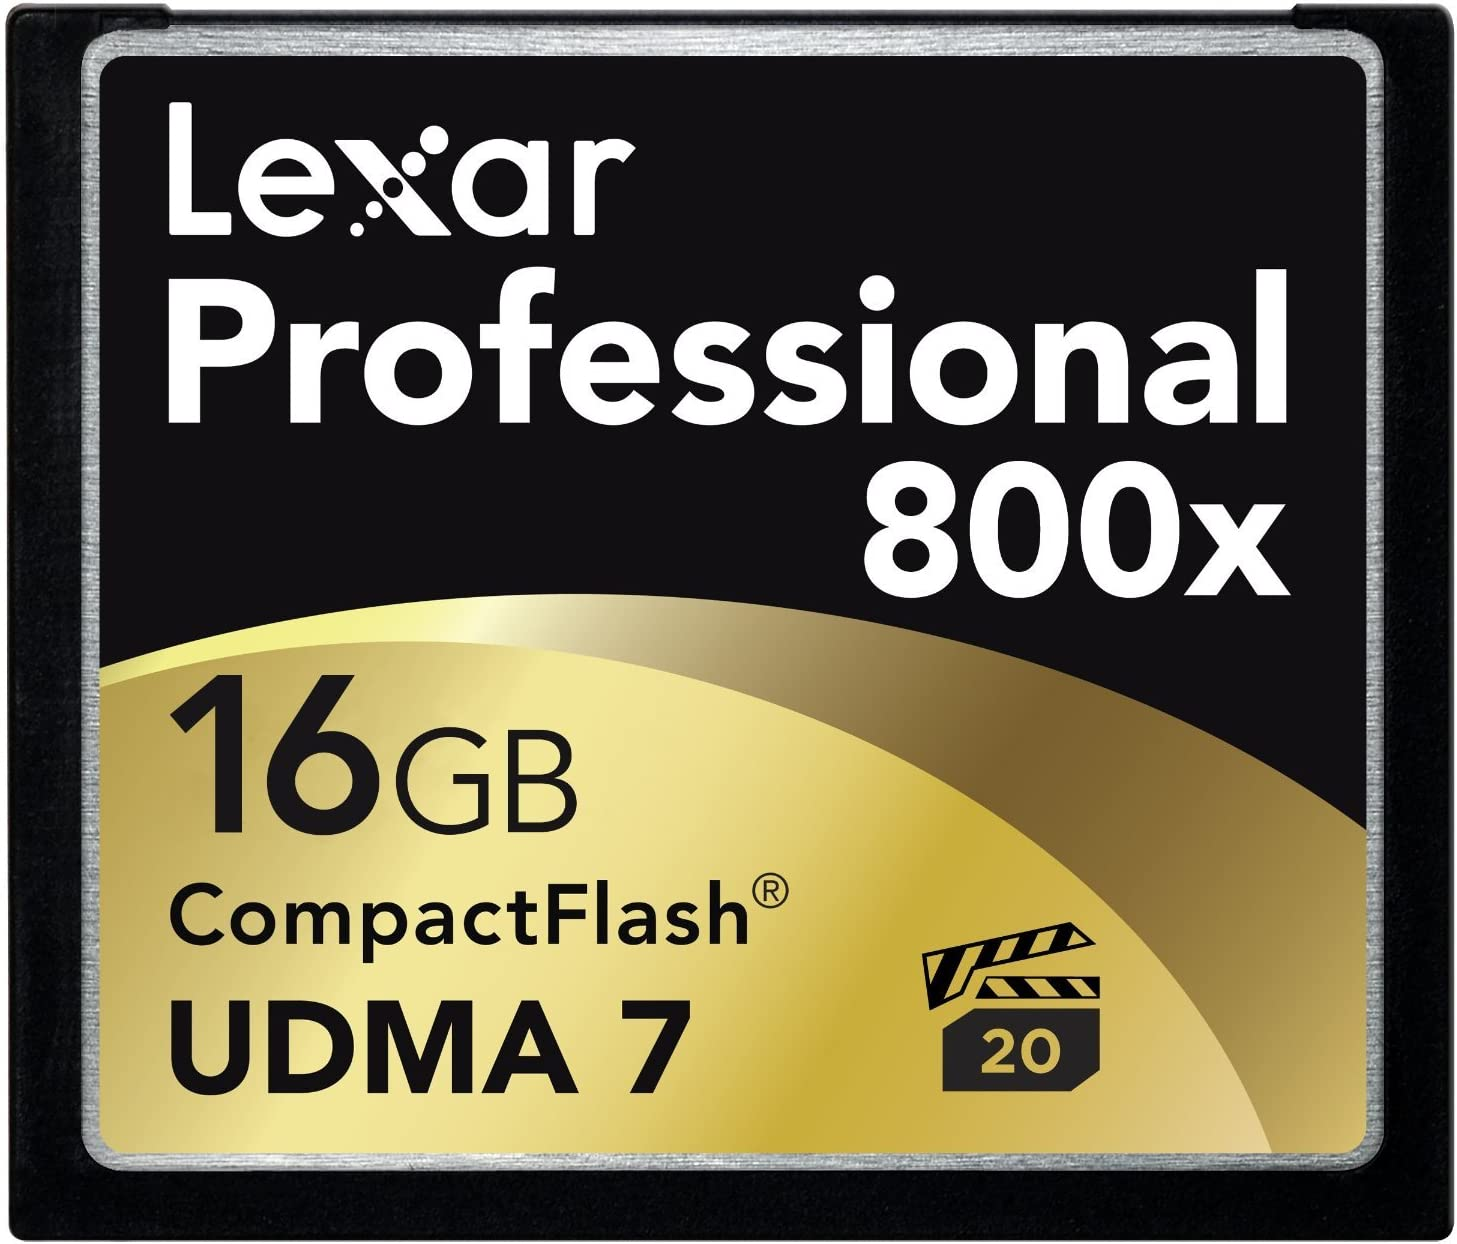 Lexar Professional 800x 16GB CompactFlash Memory Card LCF16GCTBNA800